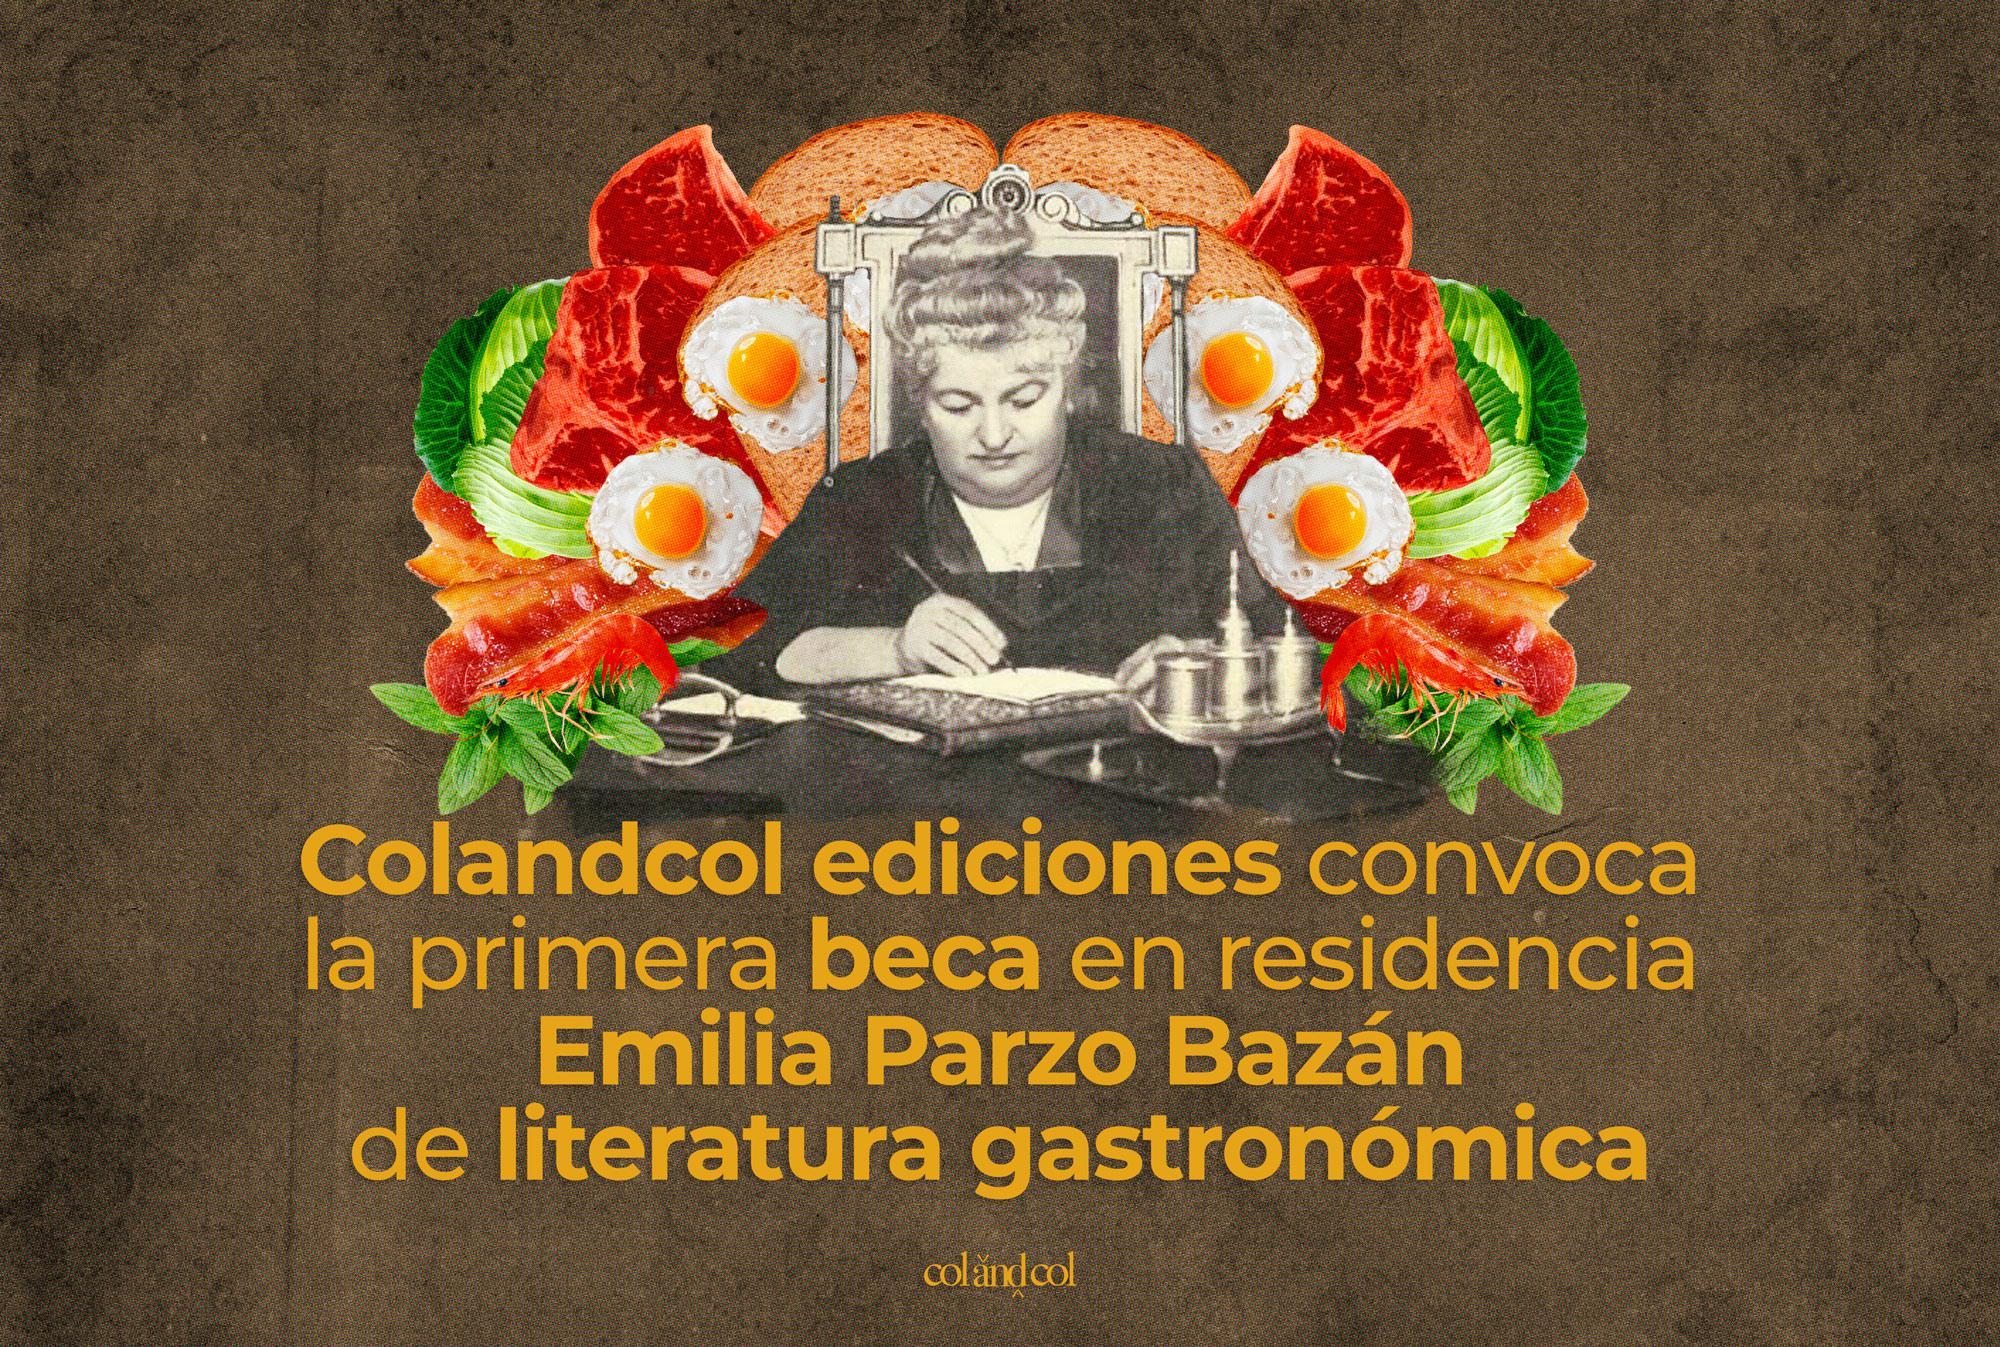 Beca Emilia Pardo Bazán de literatura gastronómica